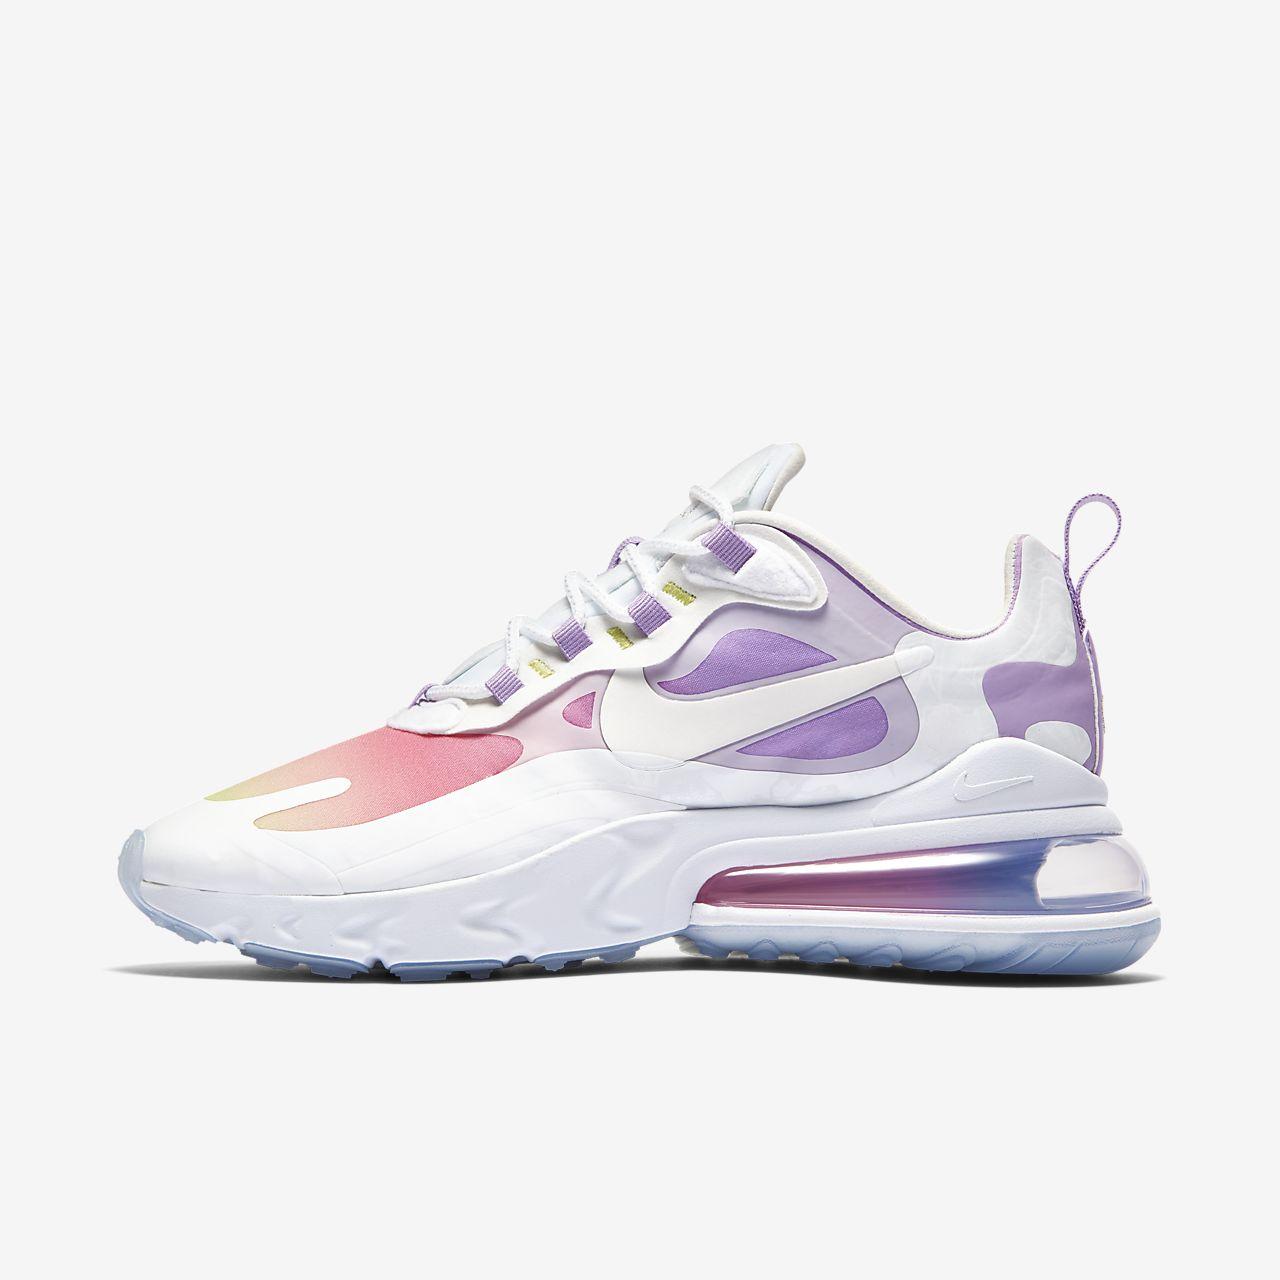 Sapatilhas Nike Air Max 270 React para mulher